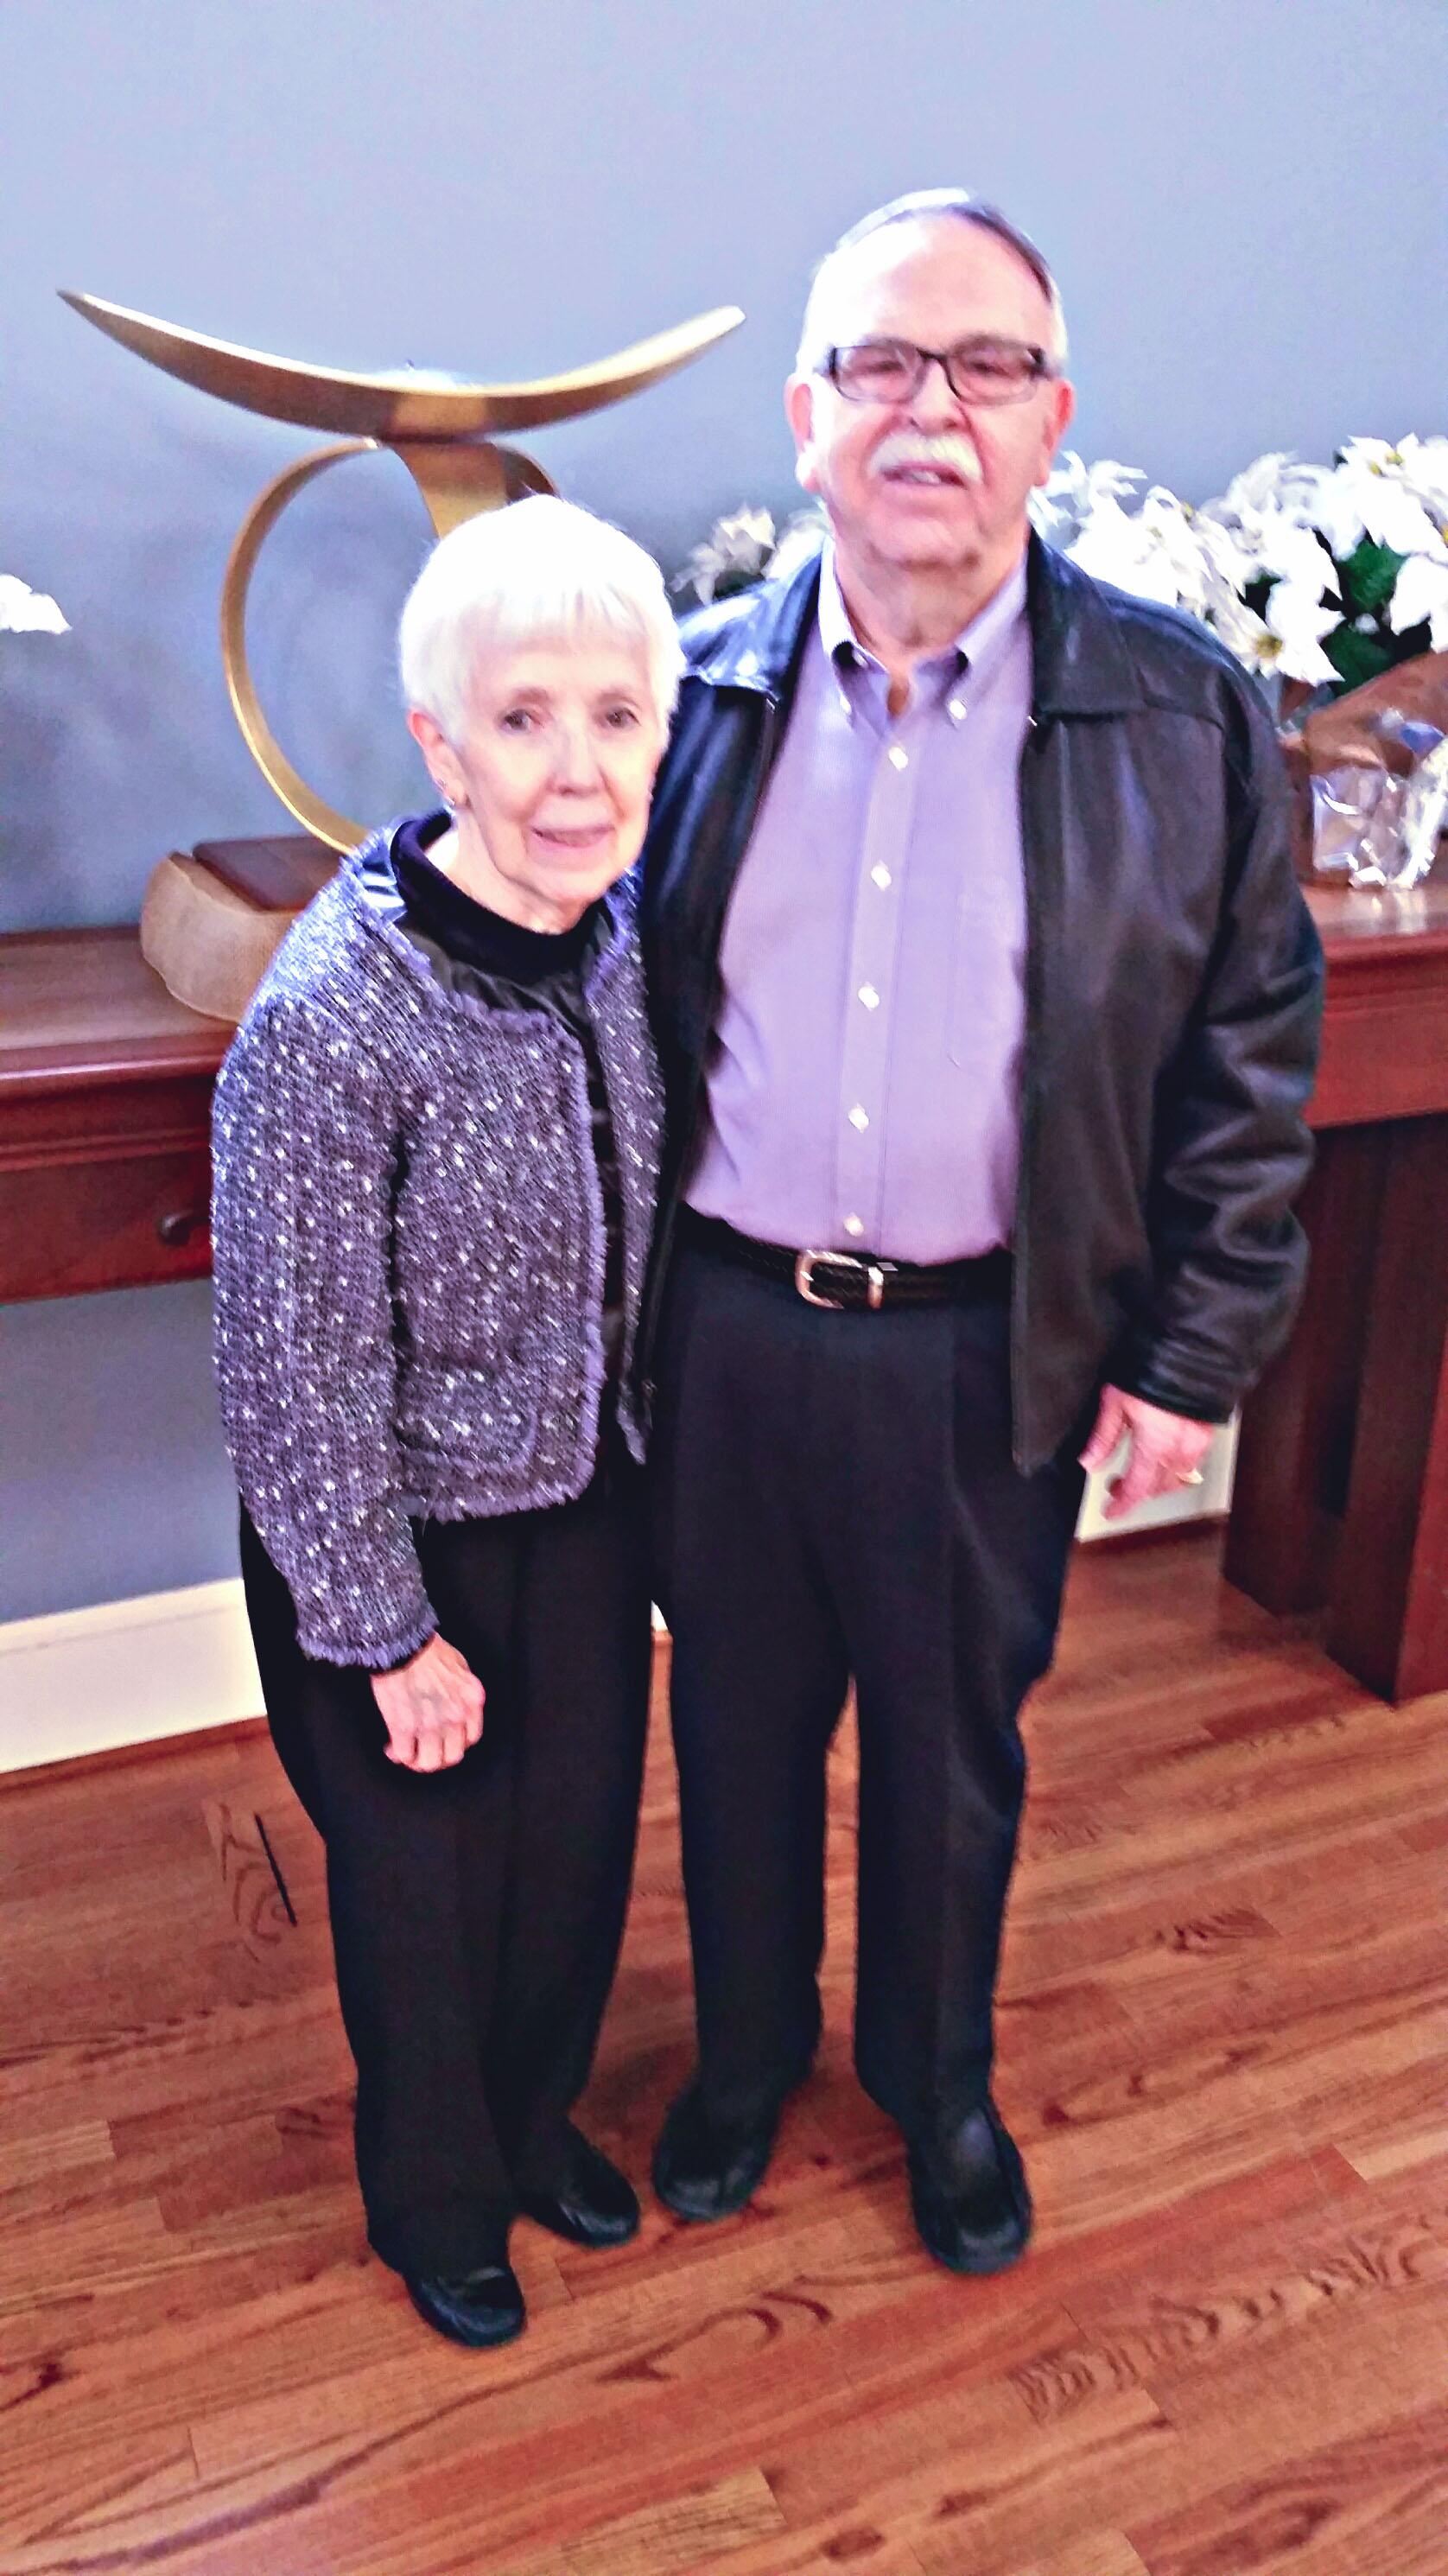 Photo by A.E. Bayne - Natalie and Ray Davis at the Unitarian Universalist Fellowship of Fredericksburg